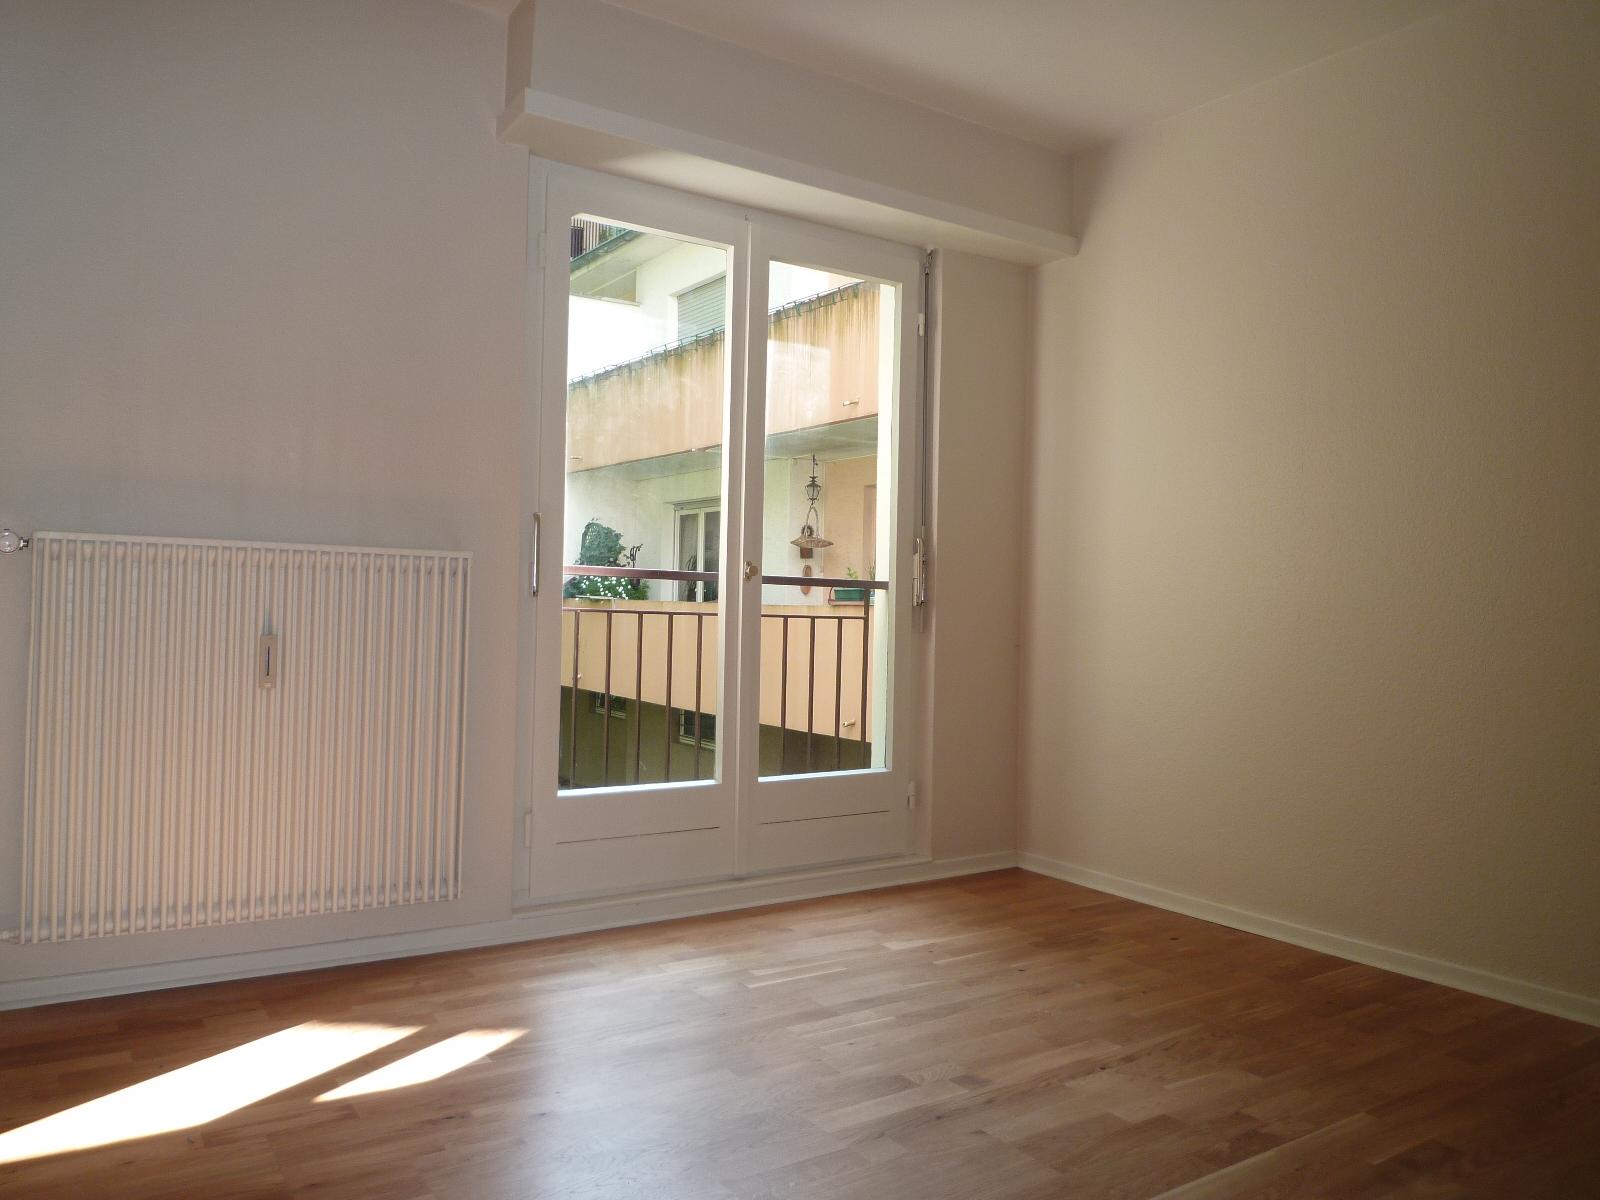 [Jungle] Beau 3 pièces avec balcon - Meinau / rue du Rhin Tortu - nos locations - Beausite Immobilier 4